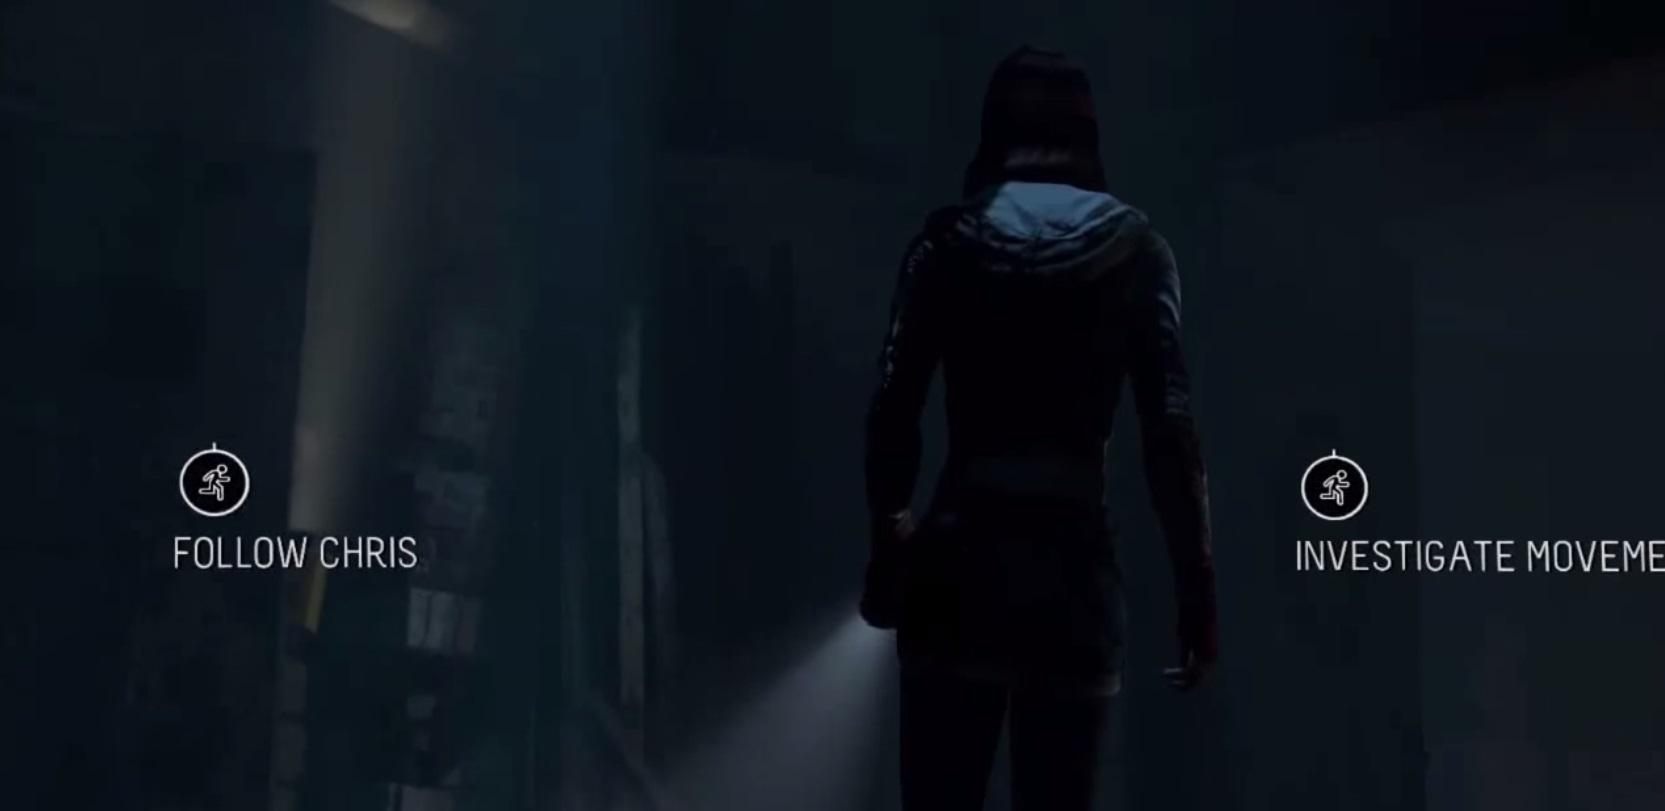 until-dawn-gameplay-screenshot-choices-ps4